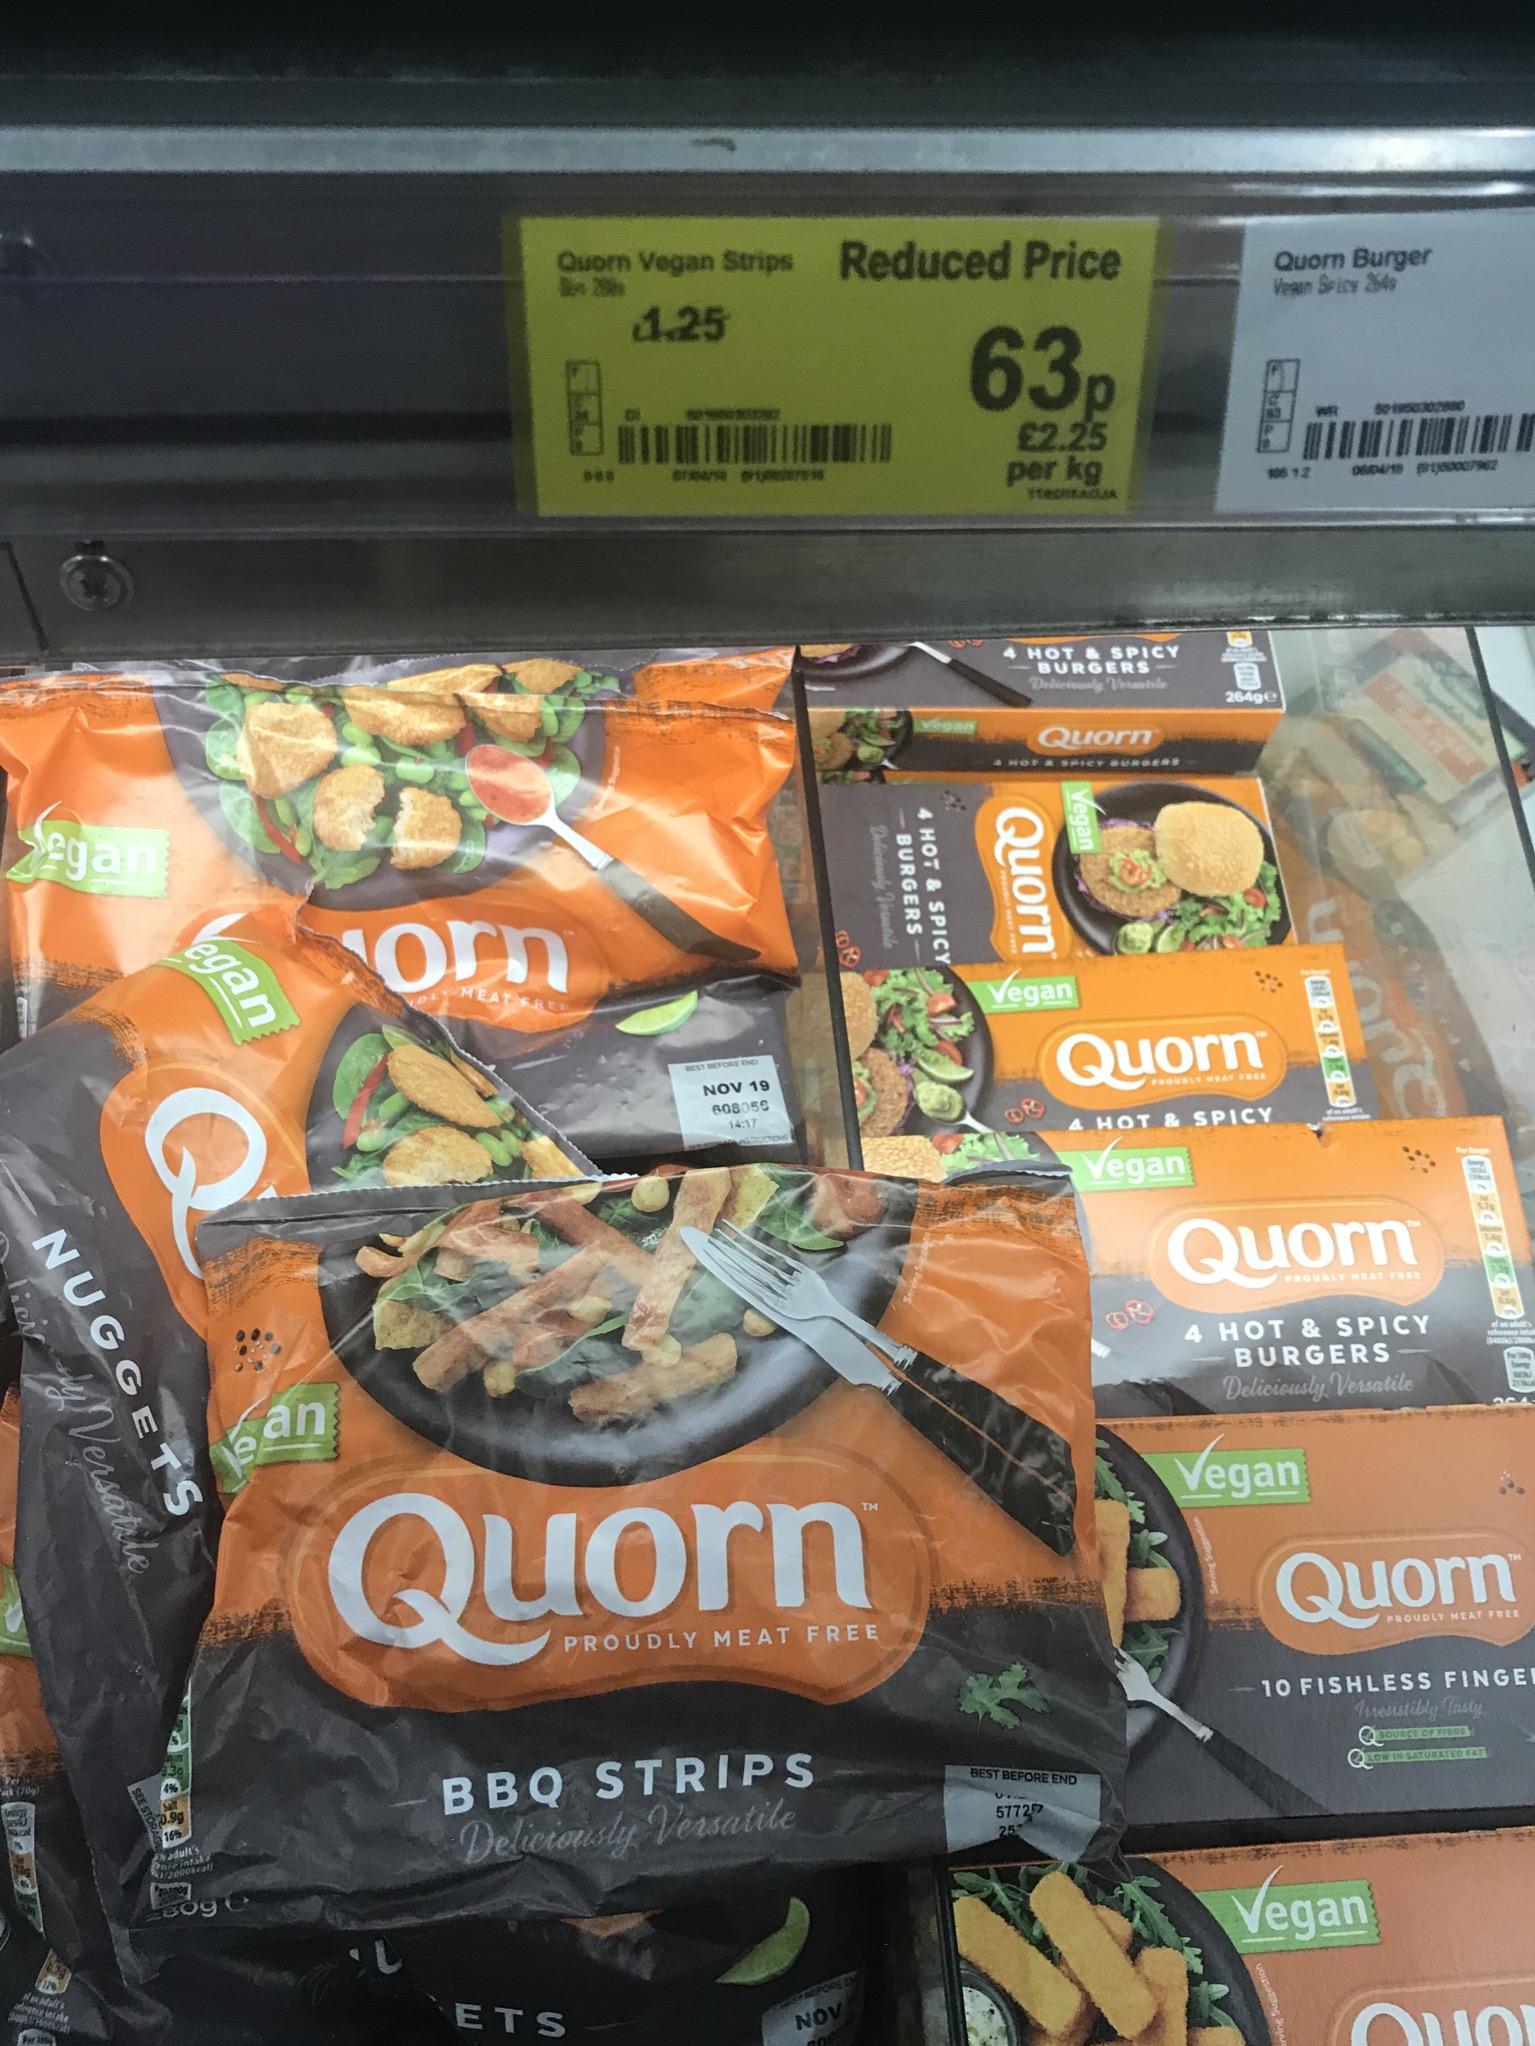 Quorn Vegan BBQ Strips - 63p instore @ Asda